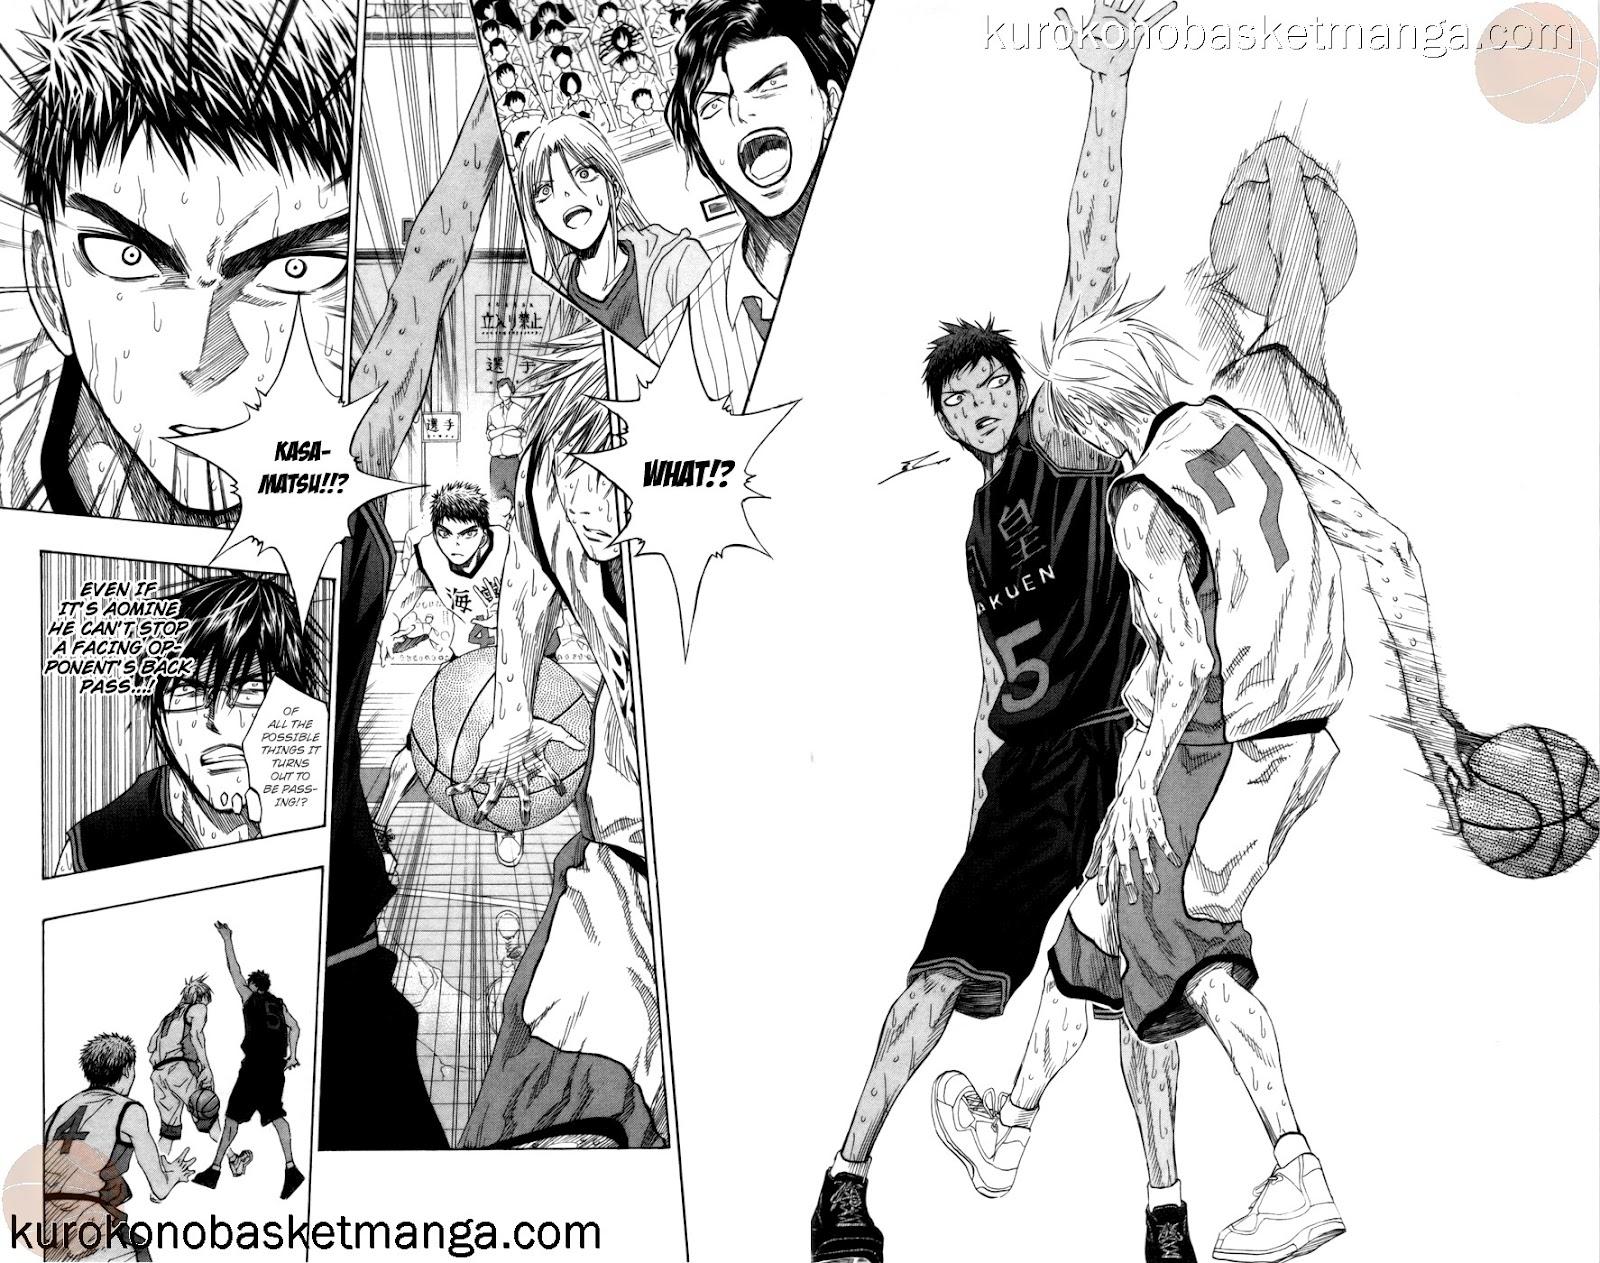 Kuroko no Basket Manga Chapter 72 - Image 06-07